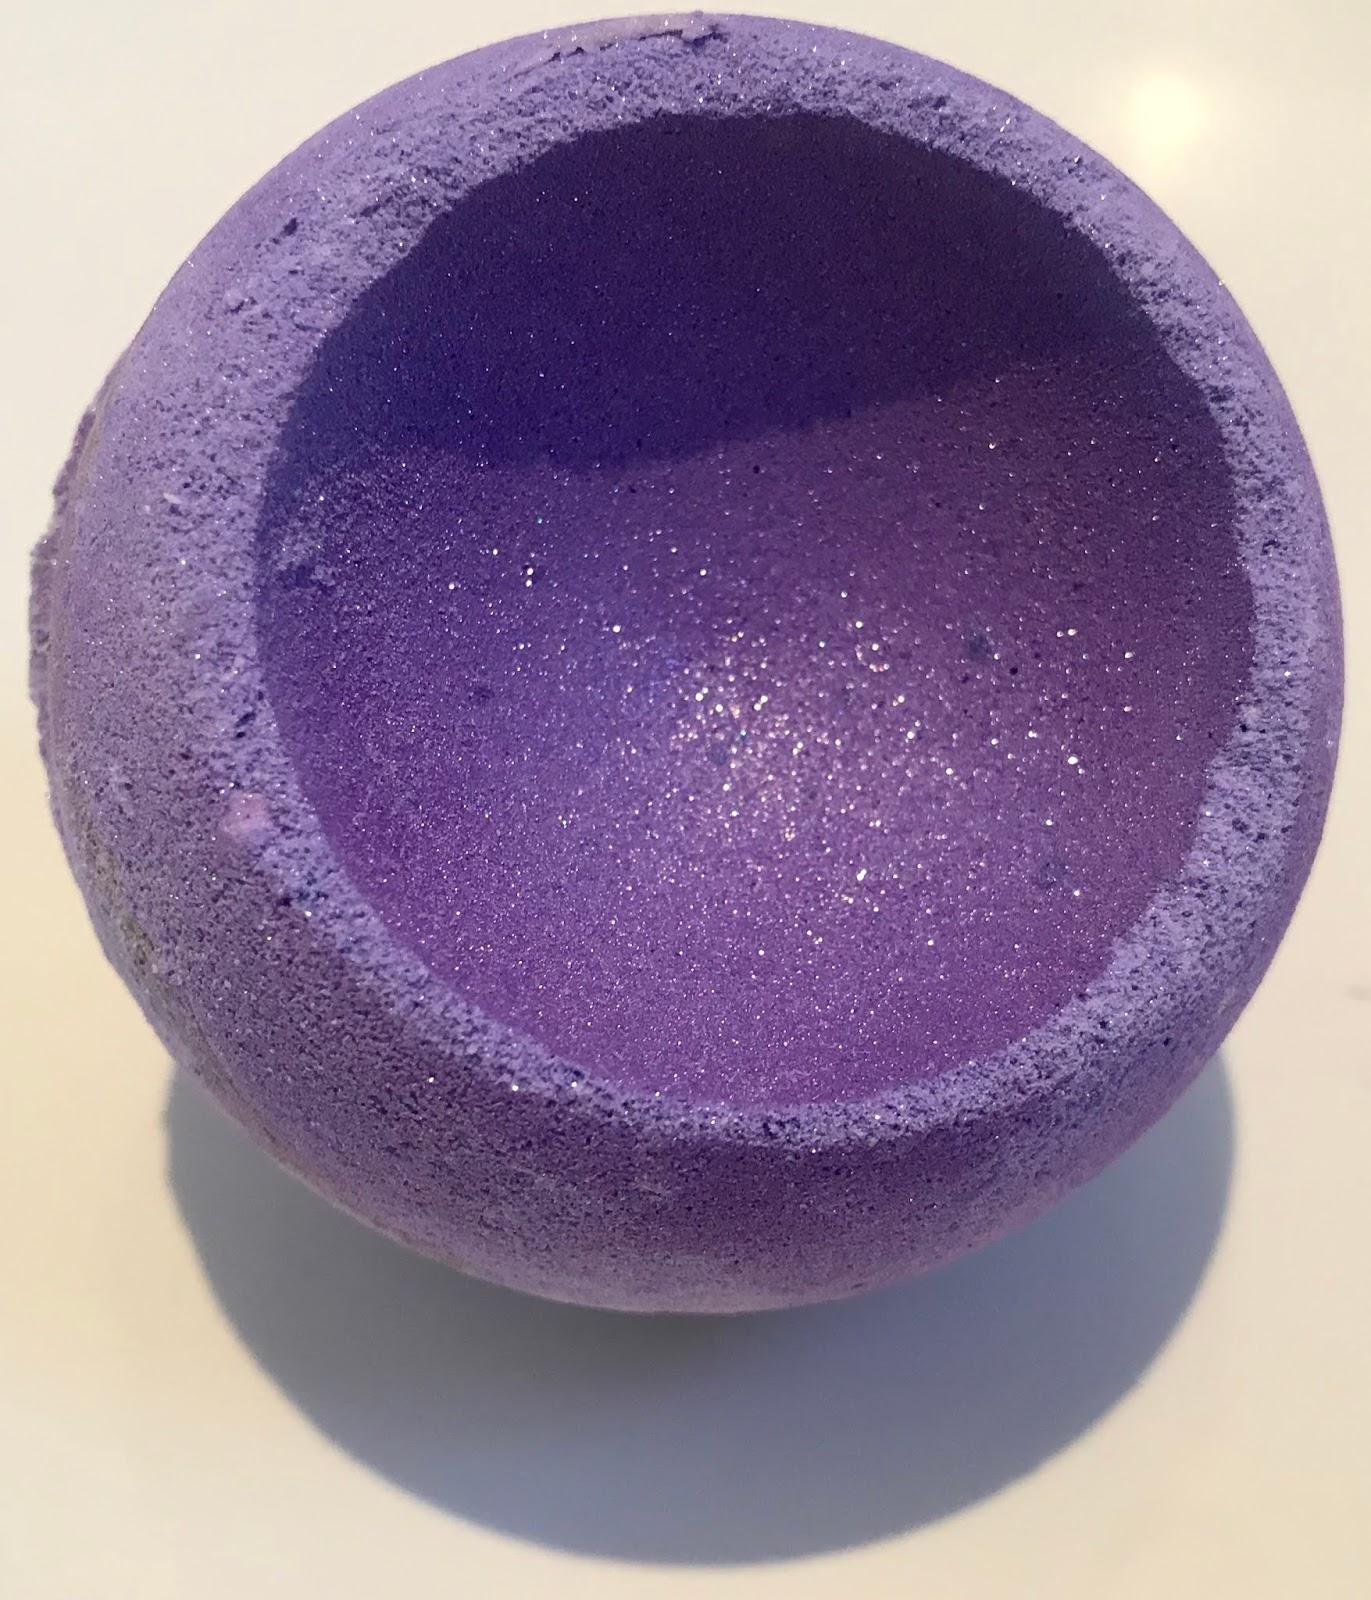 All Things Lush UK: Goddess Bath Bomb